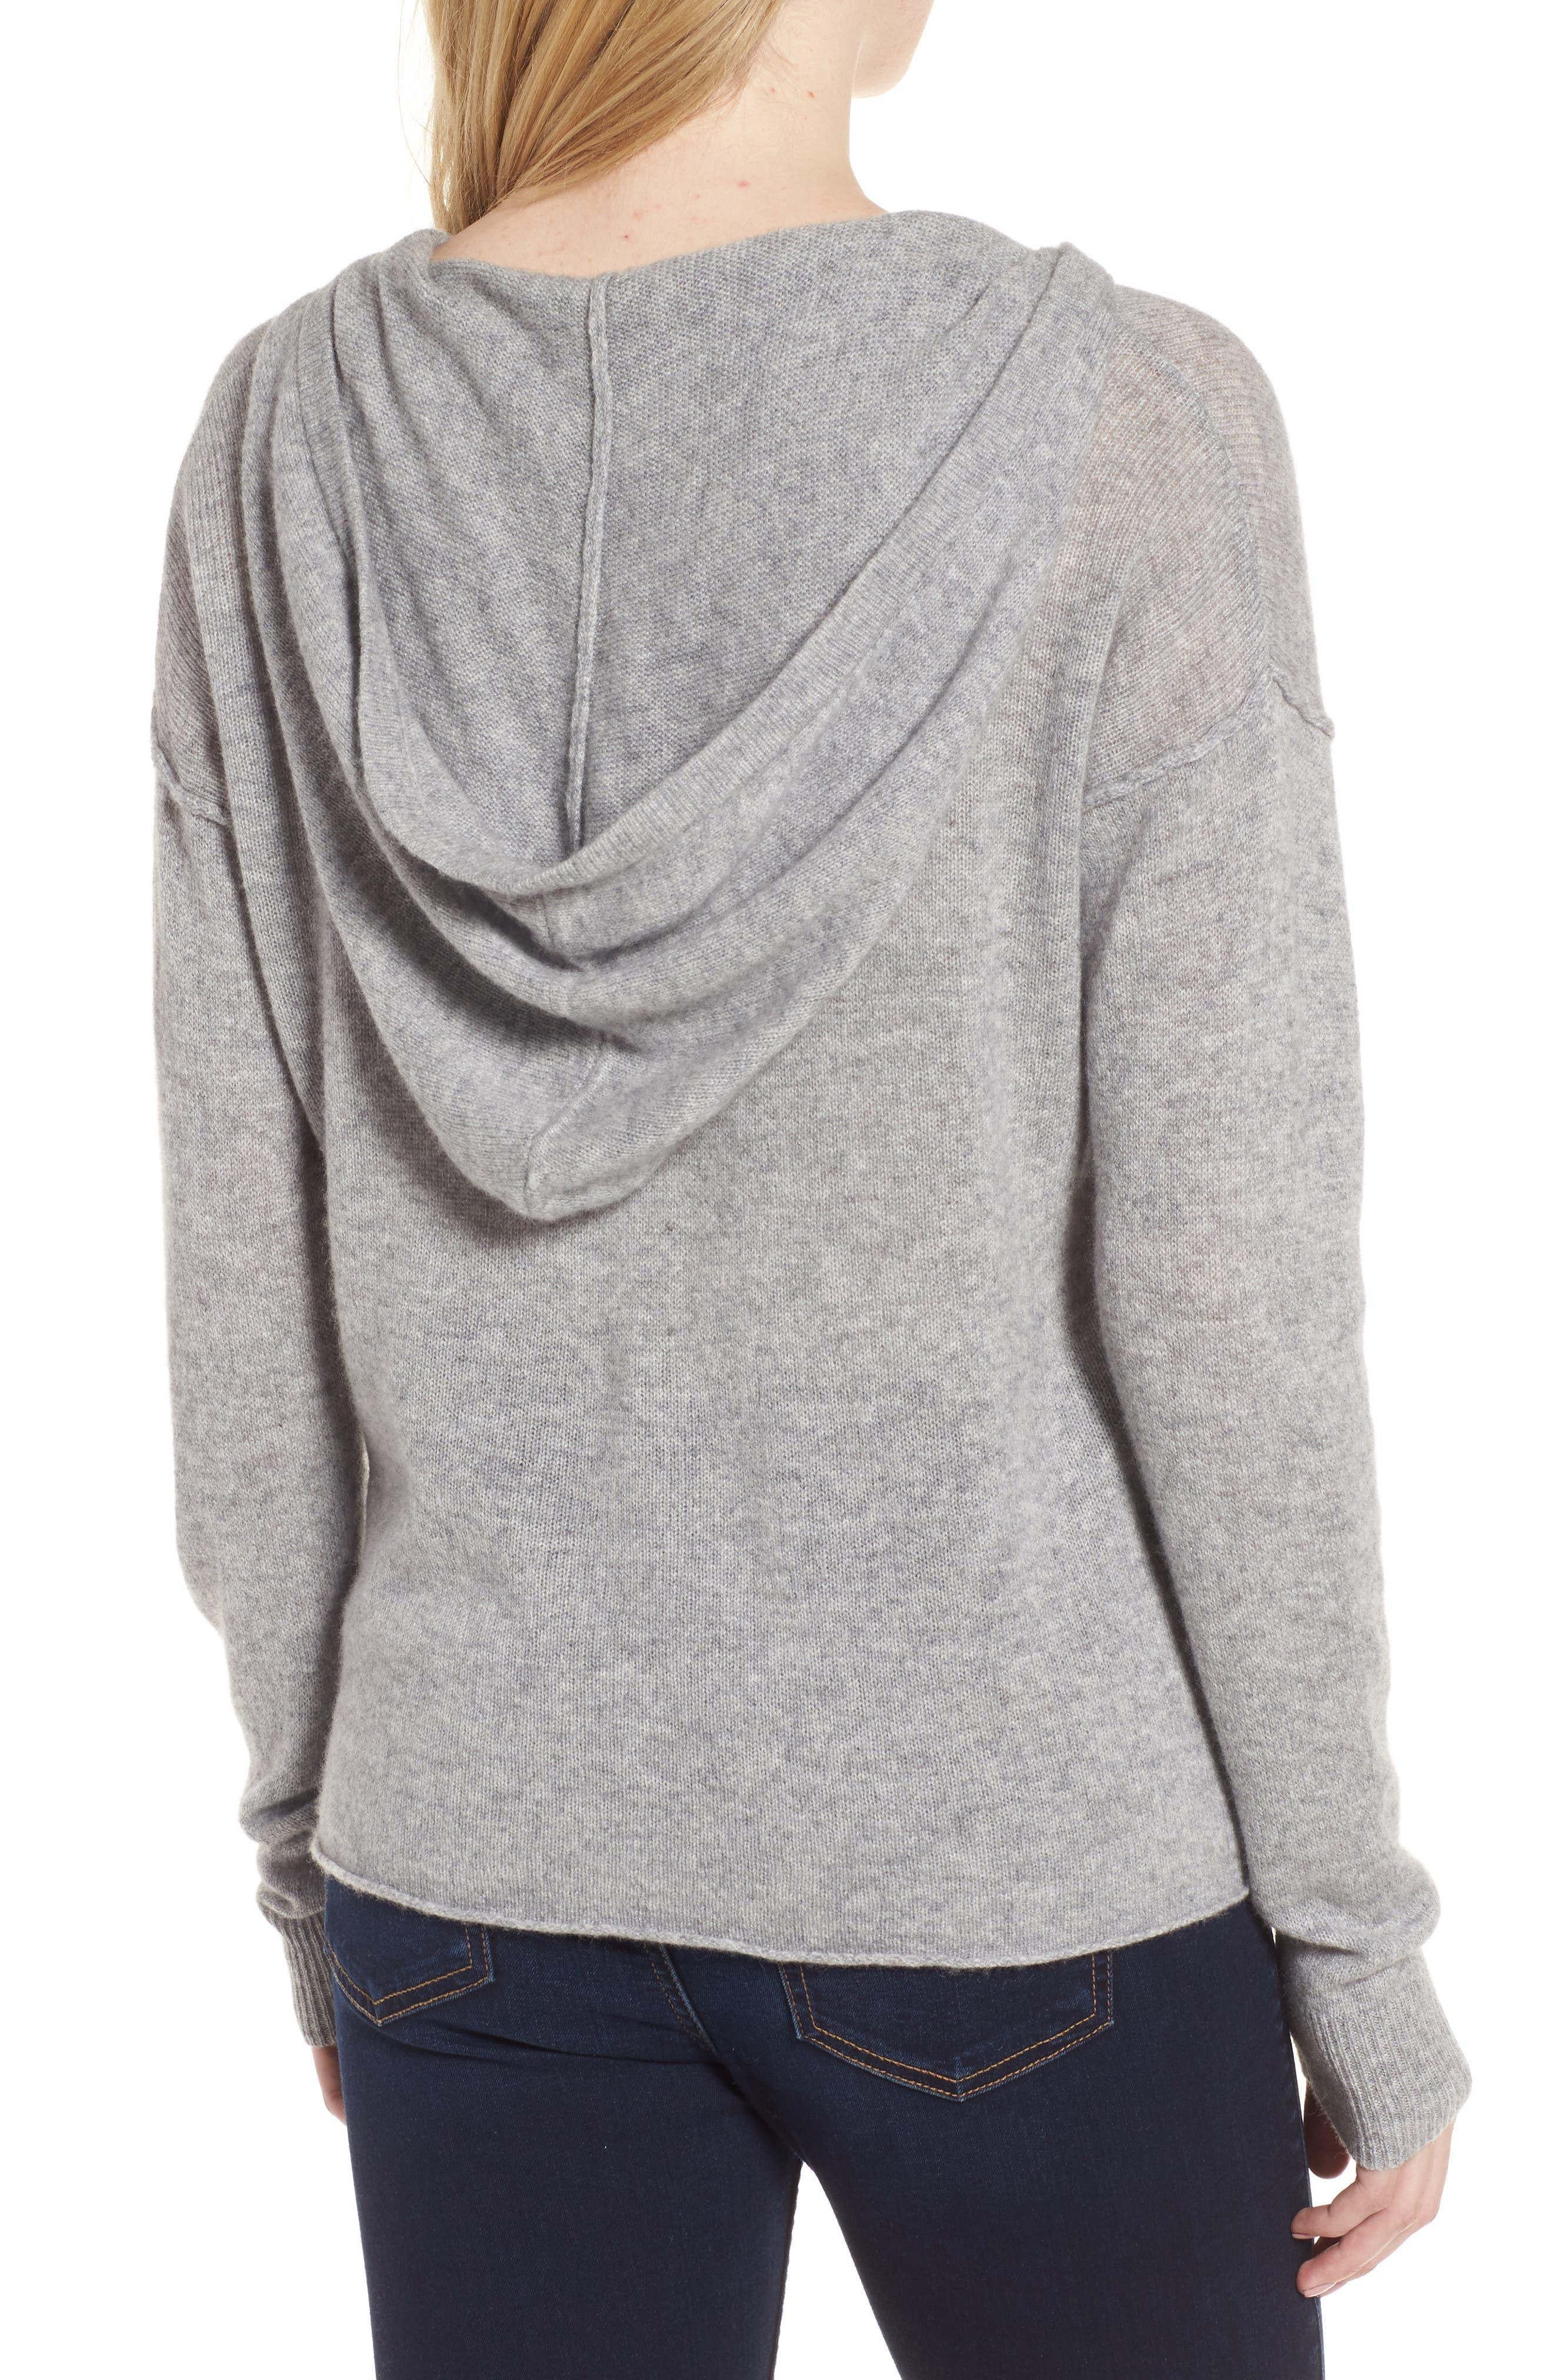 Dakota Cashmere Hooded Sweater,                             Alternate thumbnail 2, color,                             052